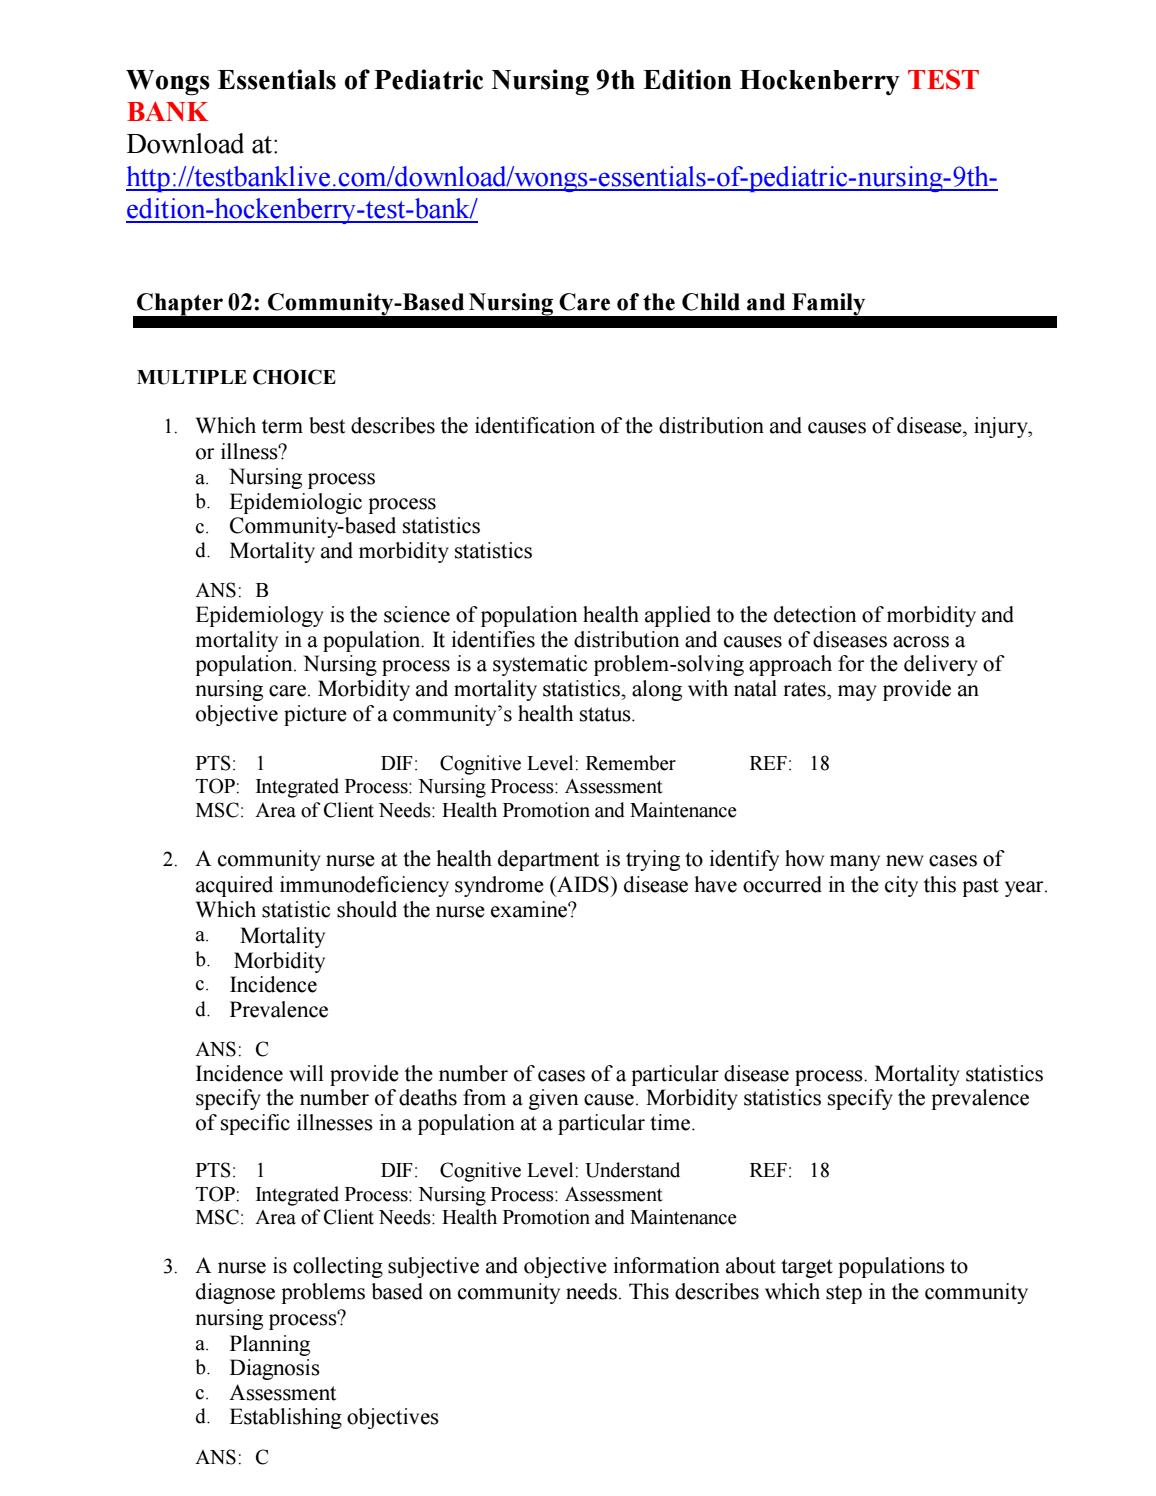 Wongs essentials of pediatric nursing 9th edition hockenberry test bank by  qlql111 - issuu